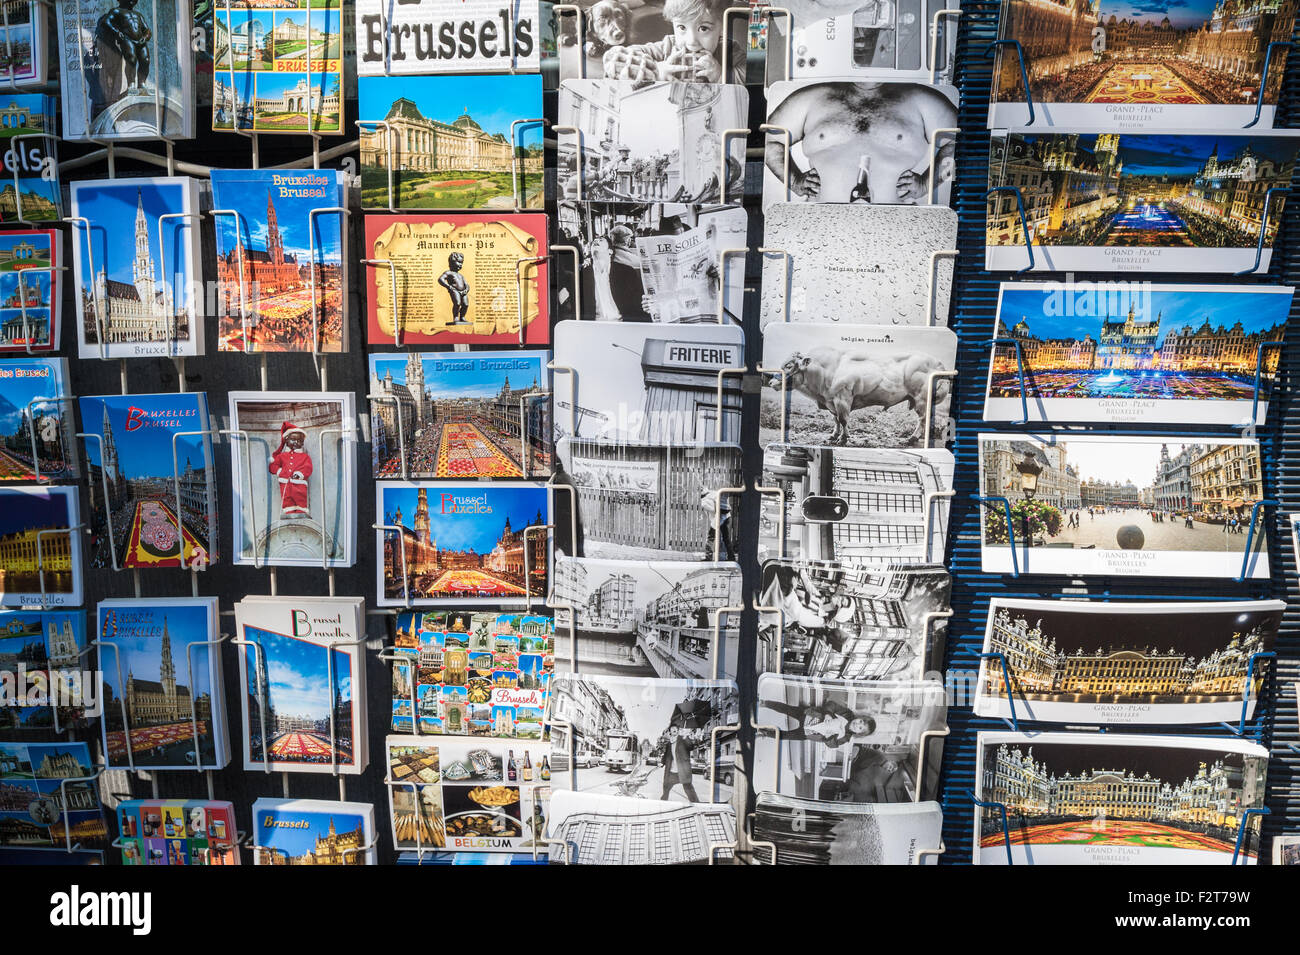 Belgium, Brussels, postcards - Stock Image